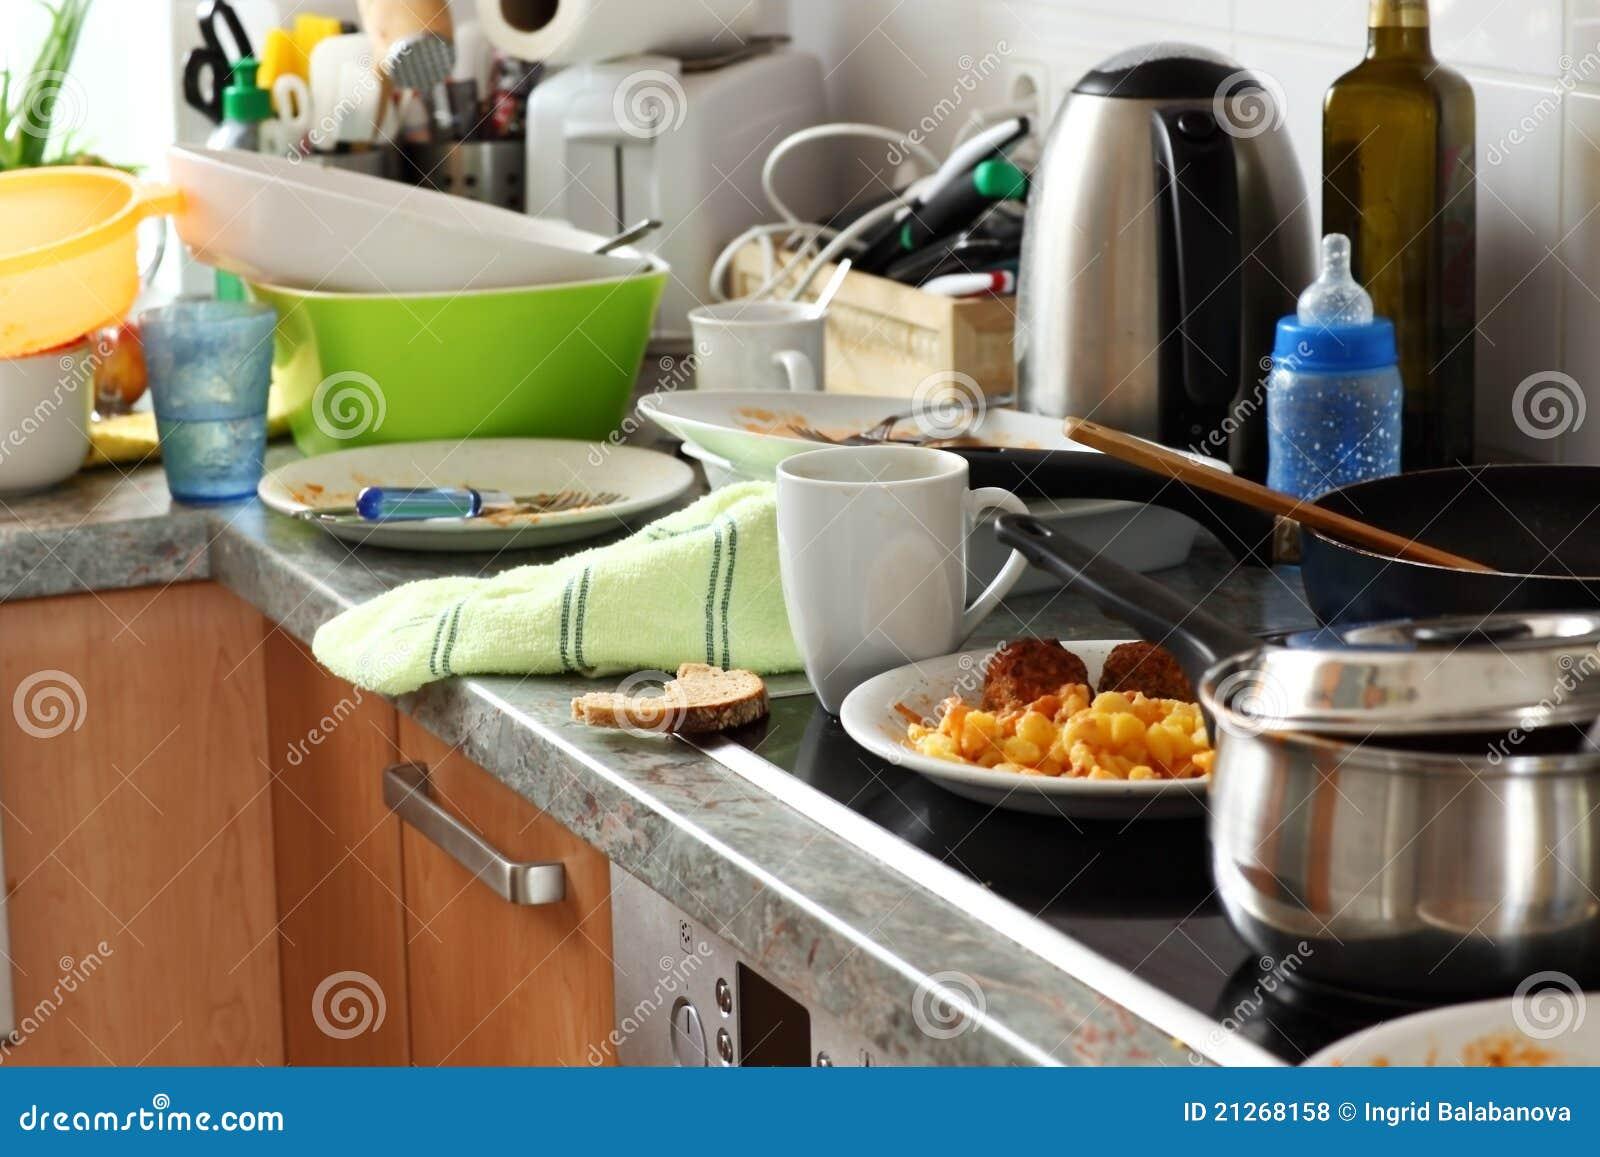 Dirty kitchen stock photo image of dish plates metal - Limpiar casa malas energias ...